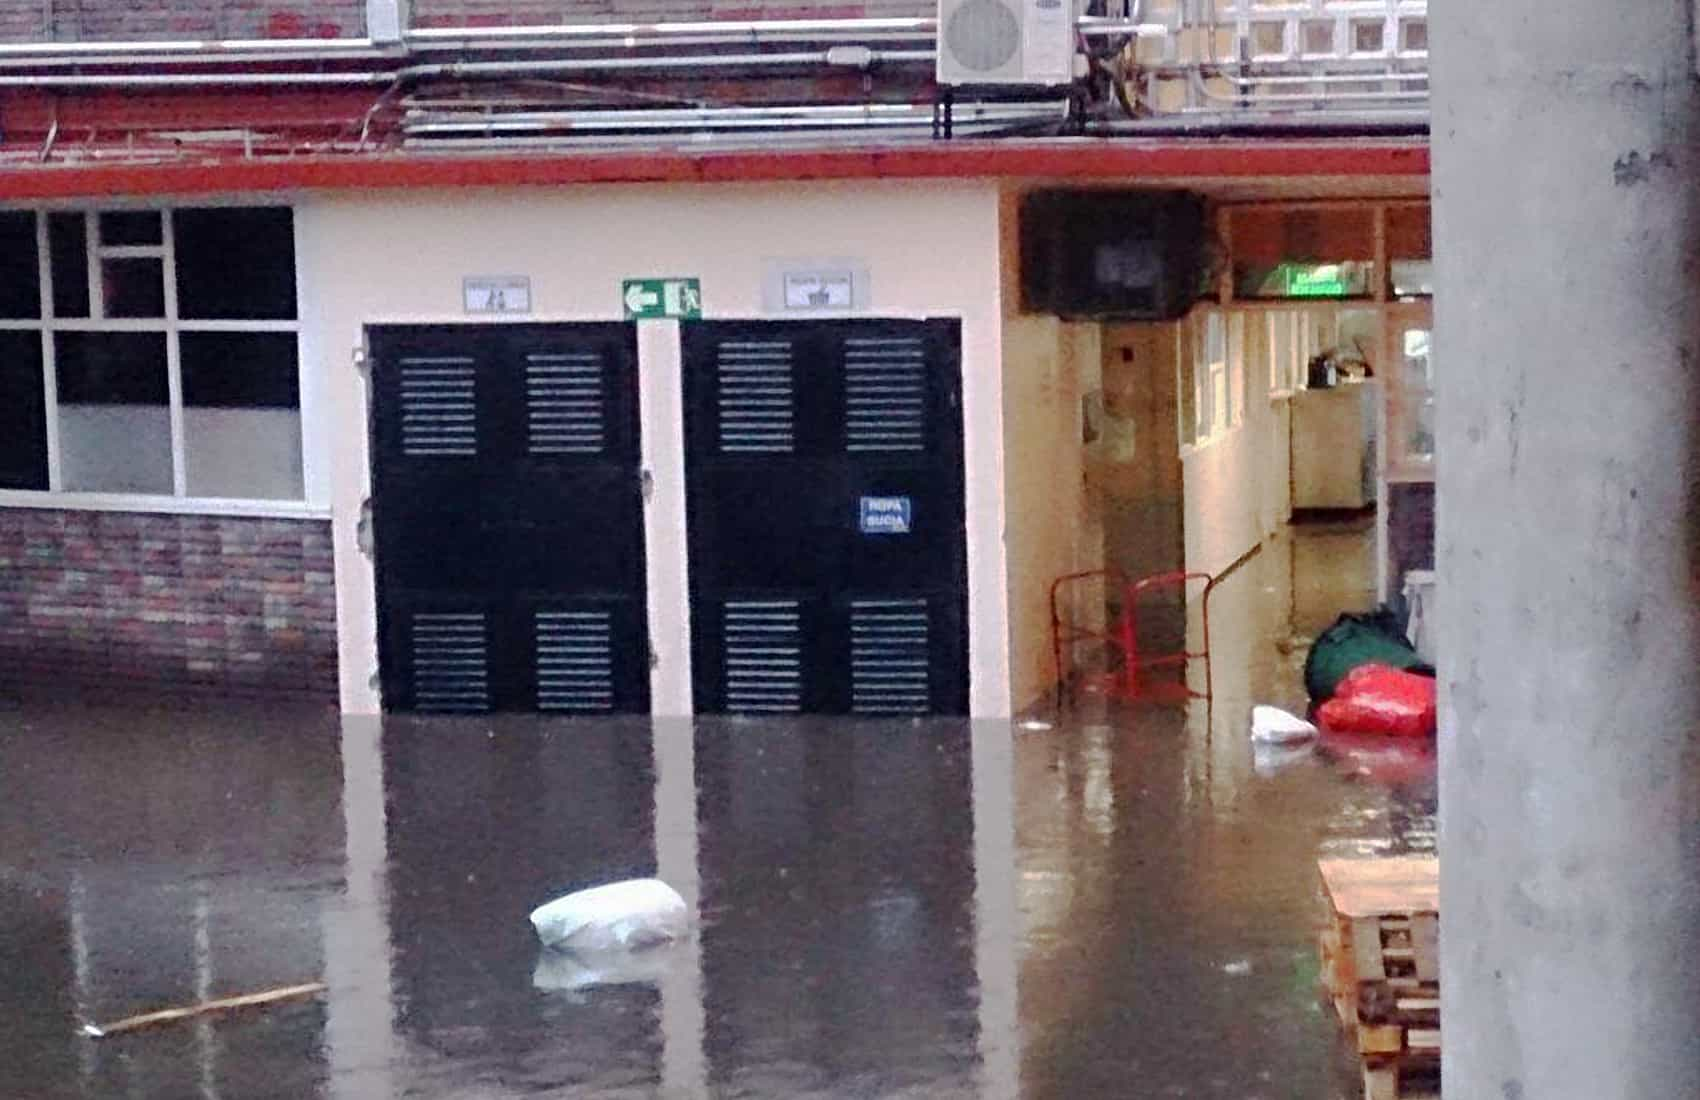 Flooding at National Children's Hospital